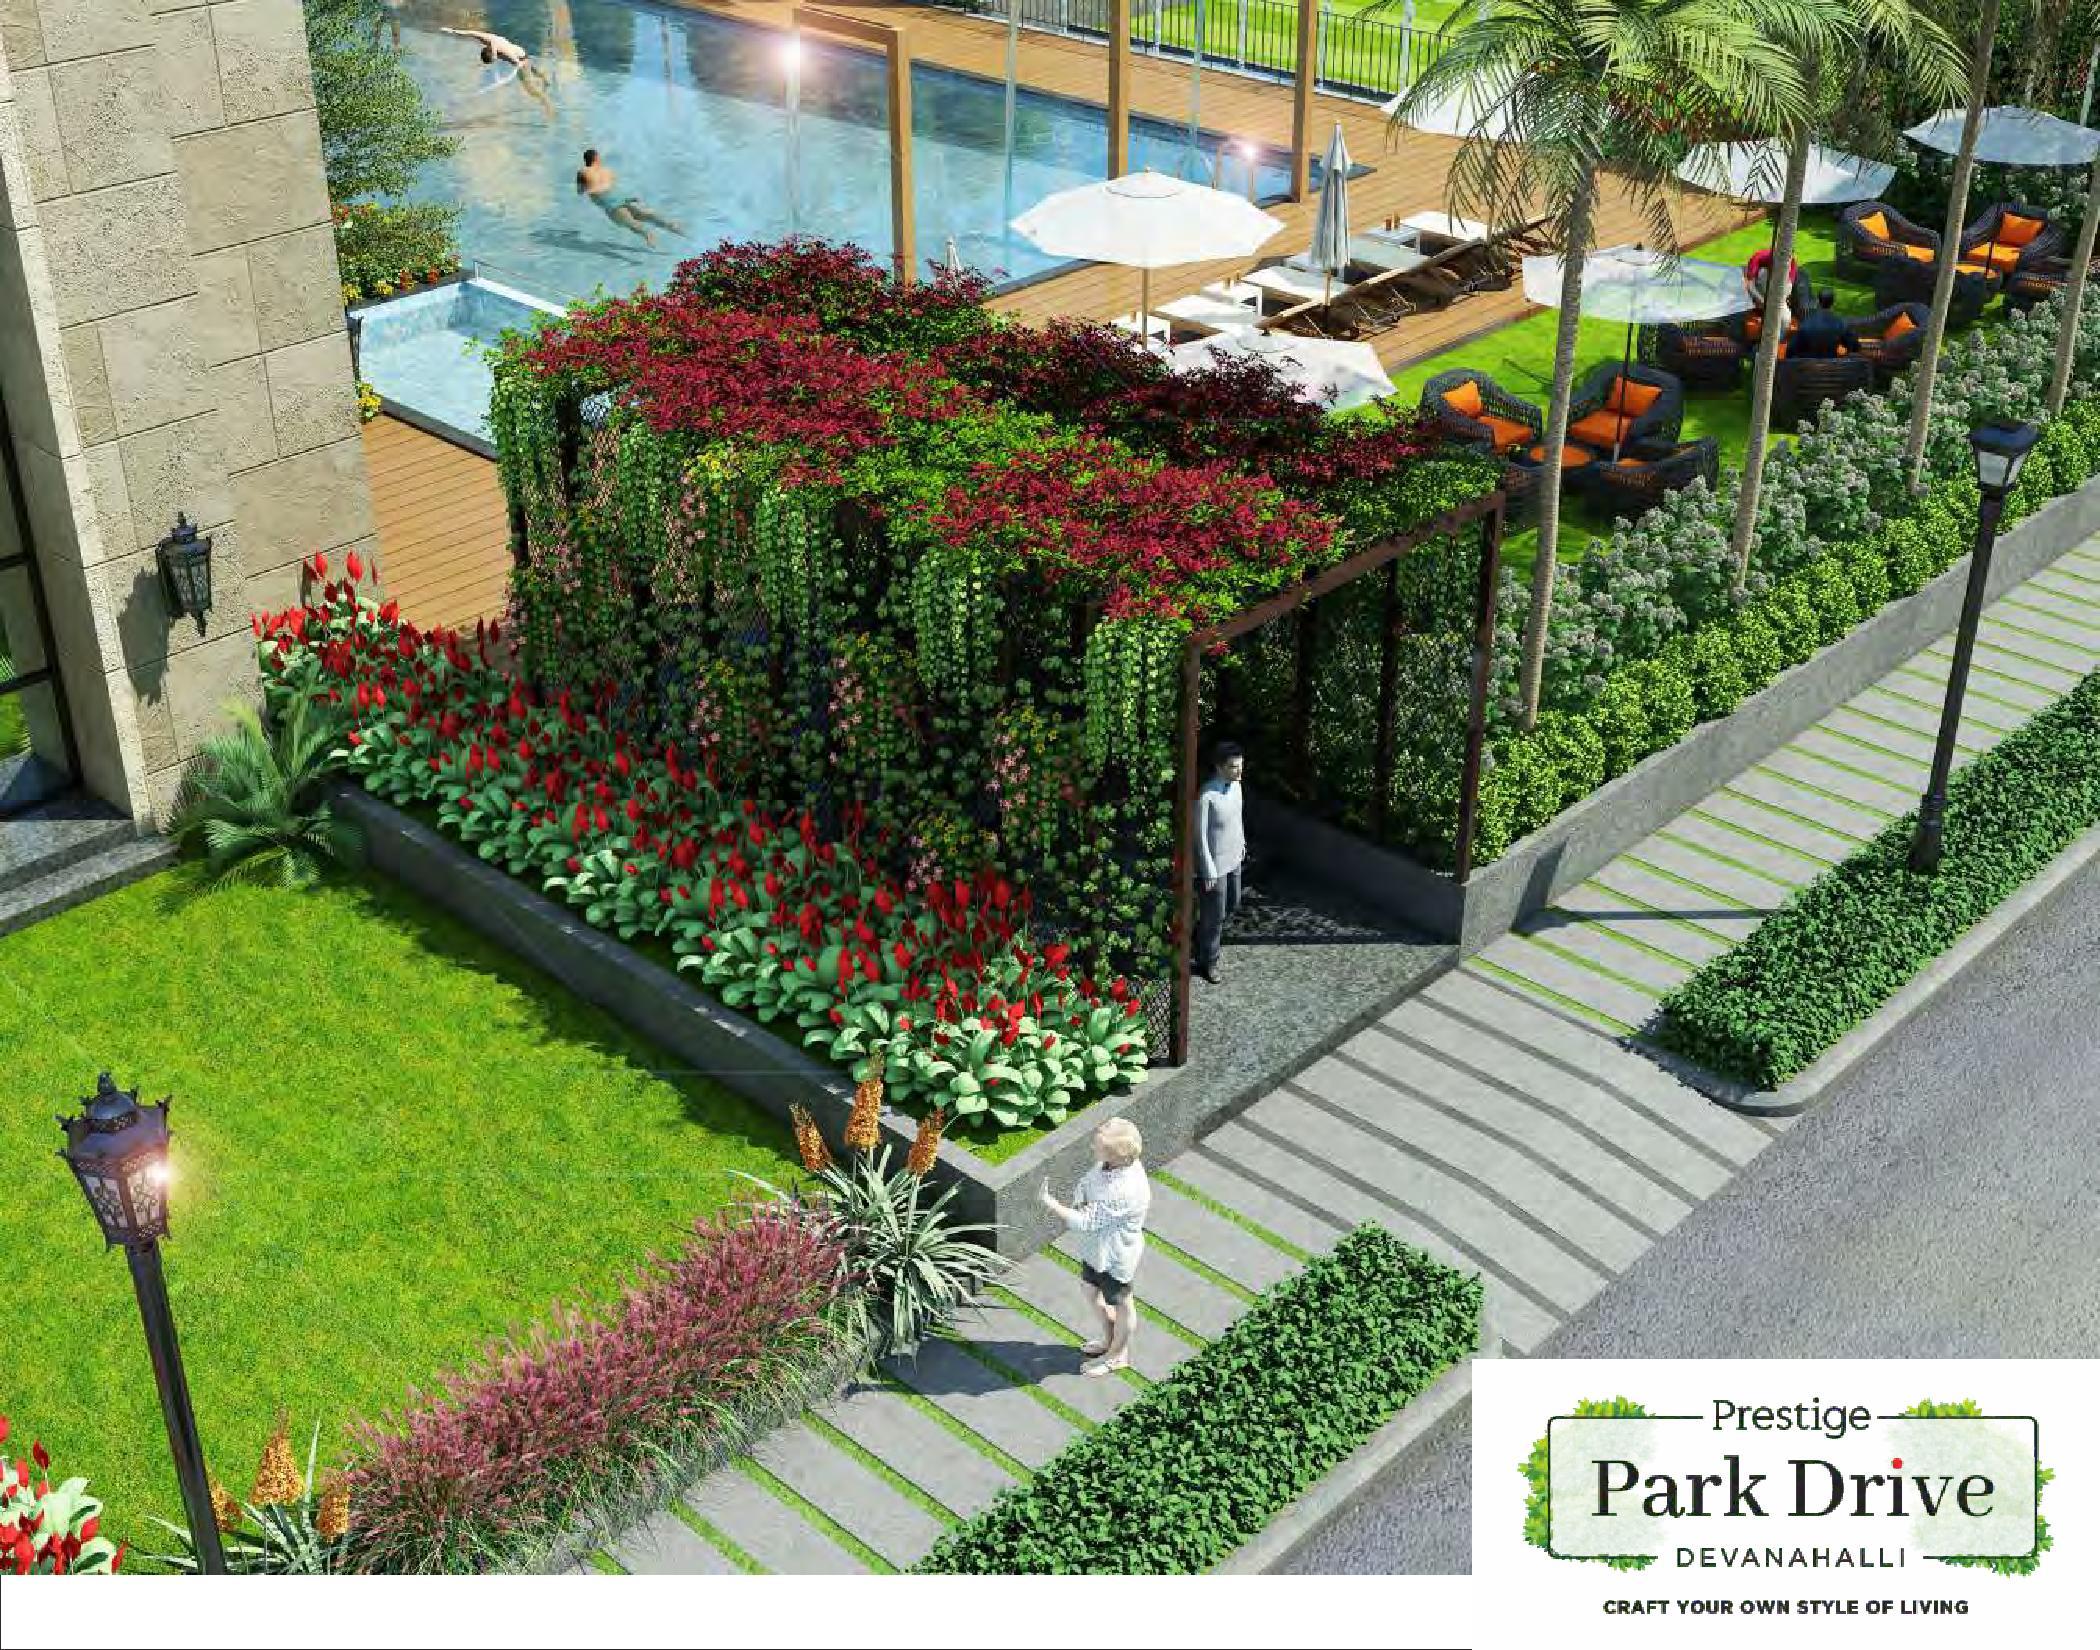 Prestige-Park-Drive-Plot-in-Devanahalli-Bangalore-Image-07